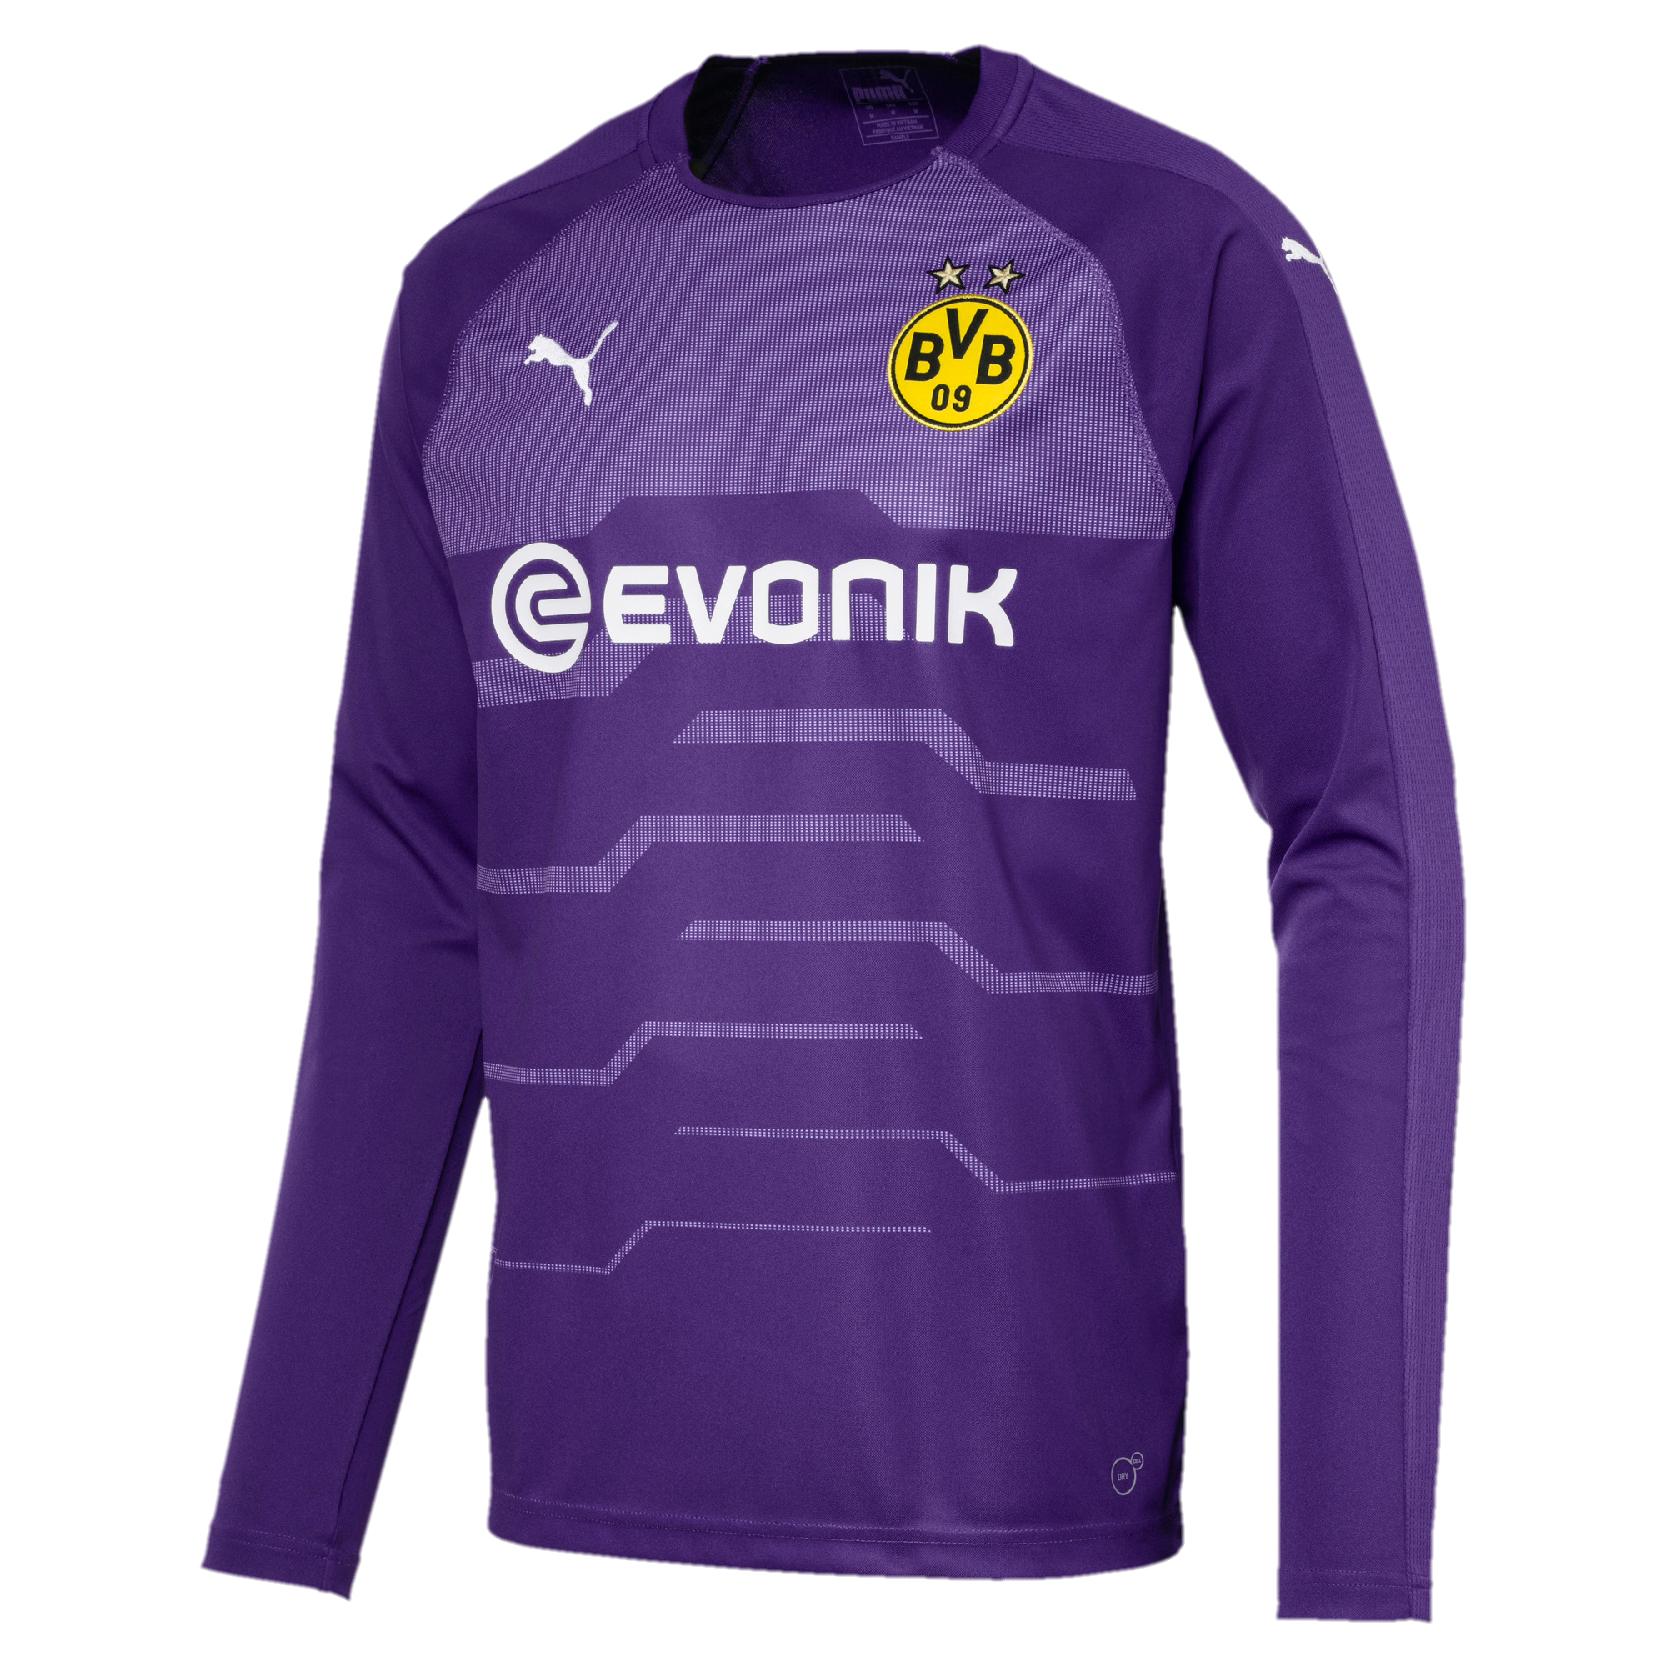 Puma BVB Borussia Dortmund Herren Trikot für 9,09€ (2 Farben - Kombideal s.Text) @ Sport-1a